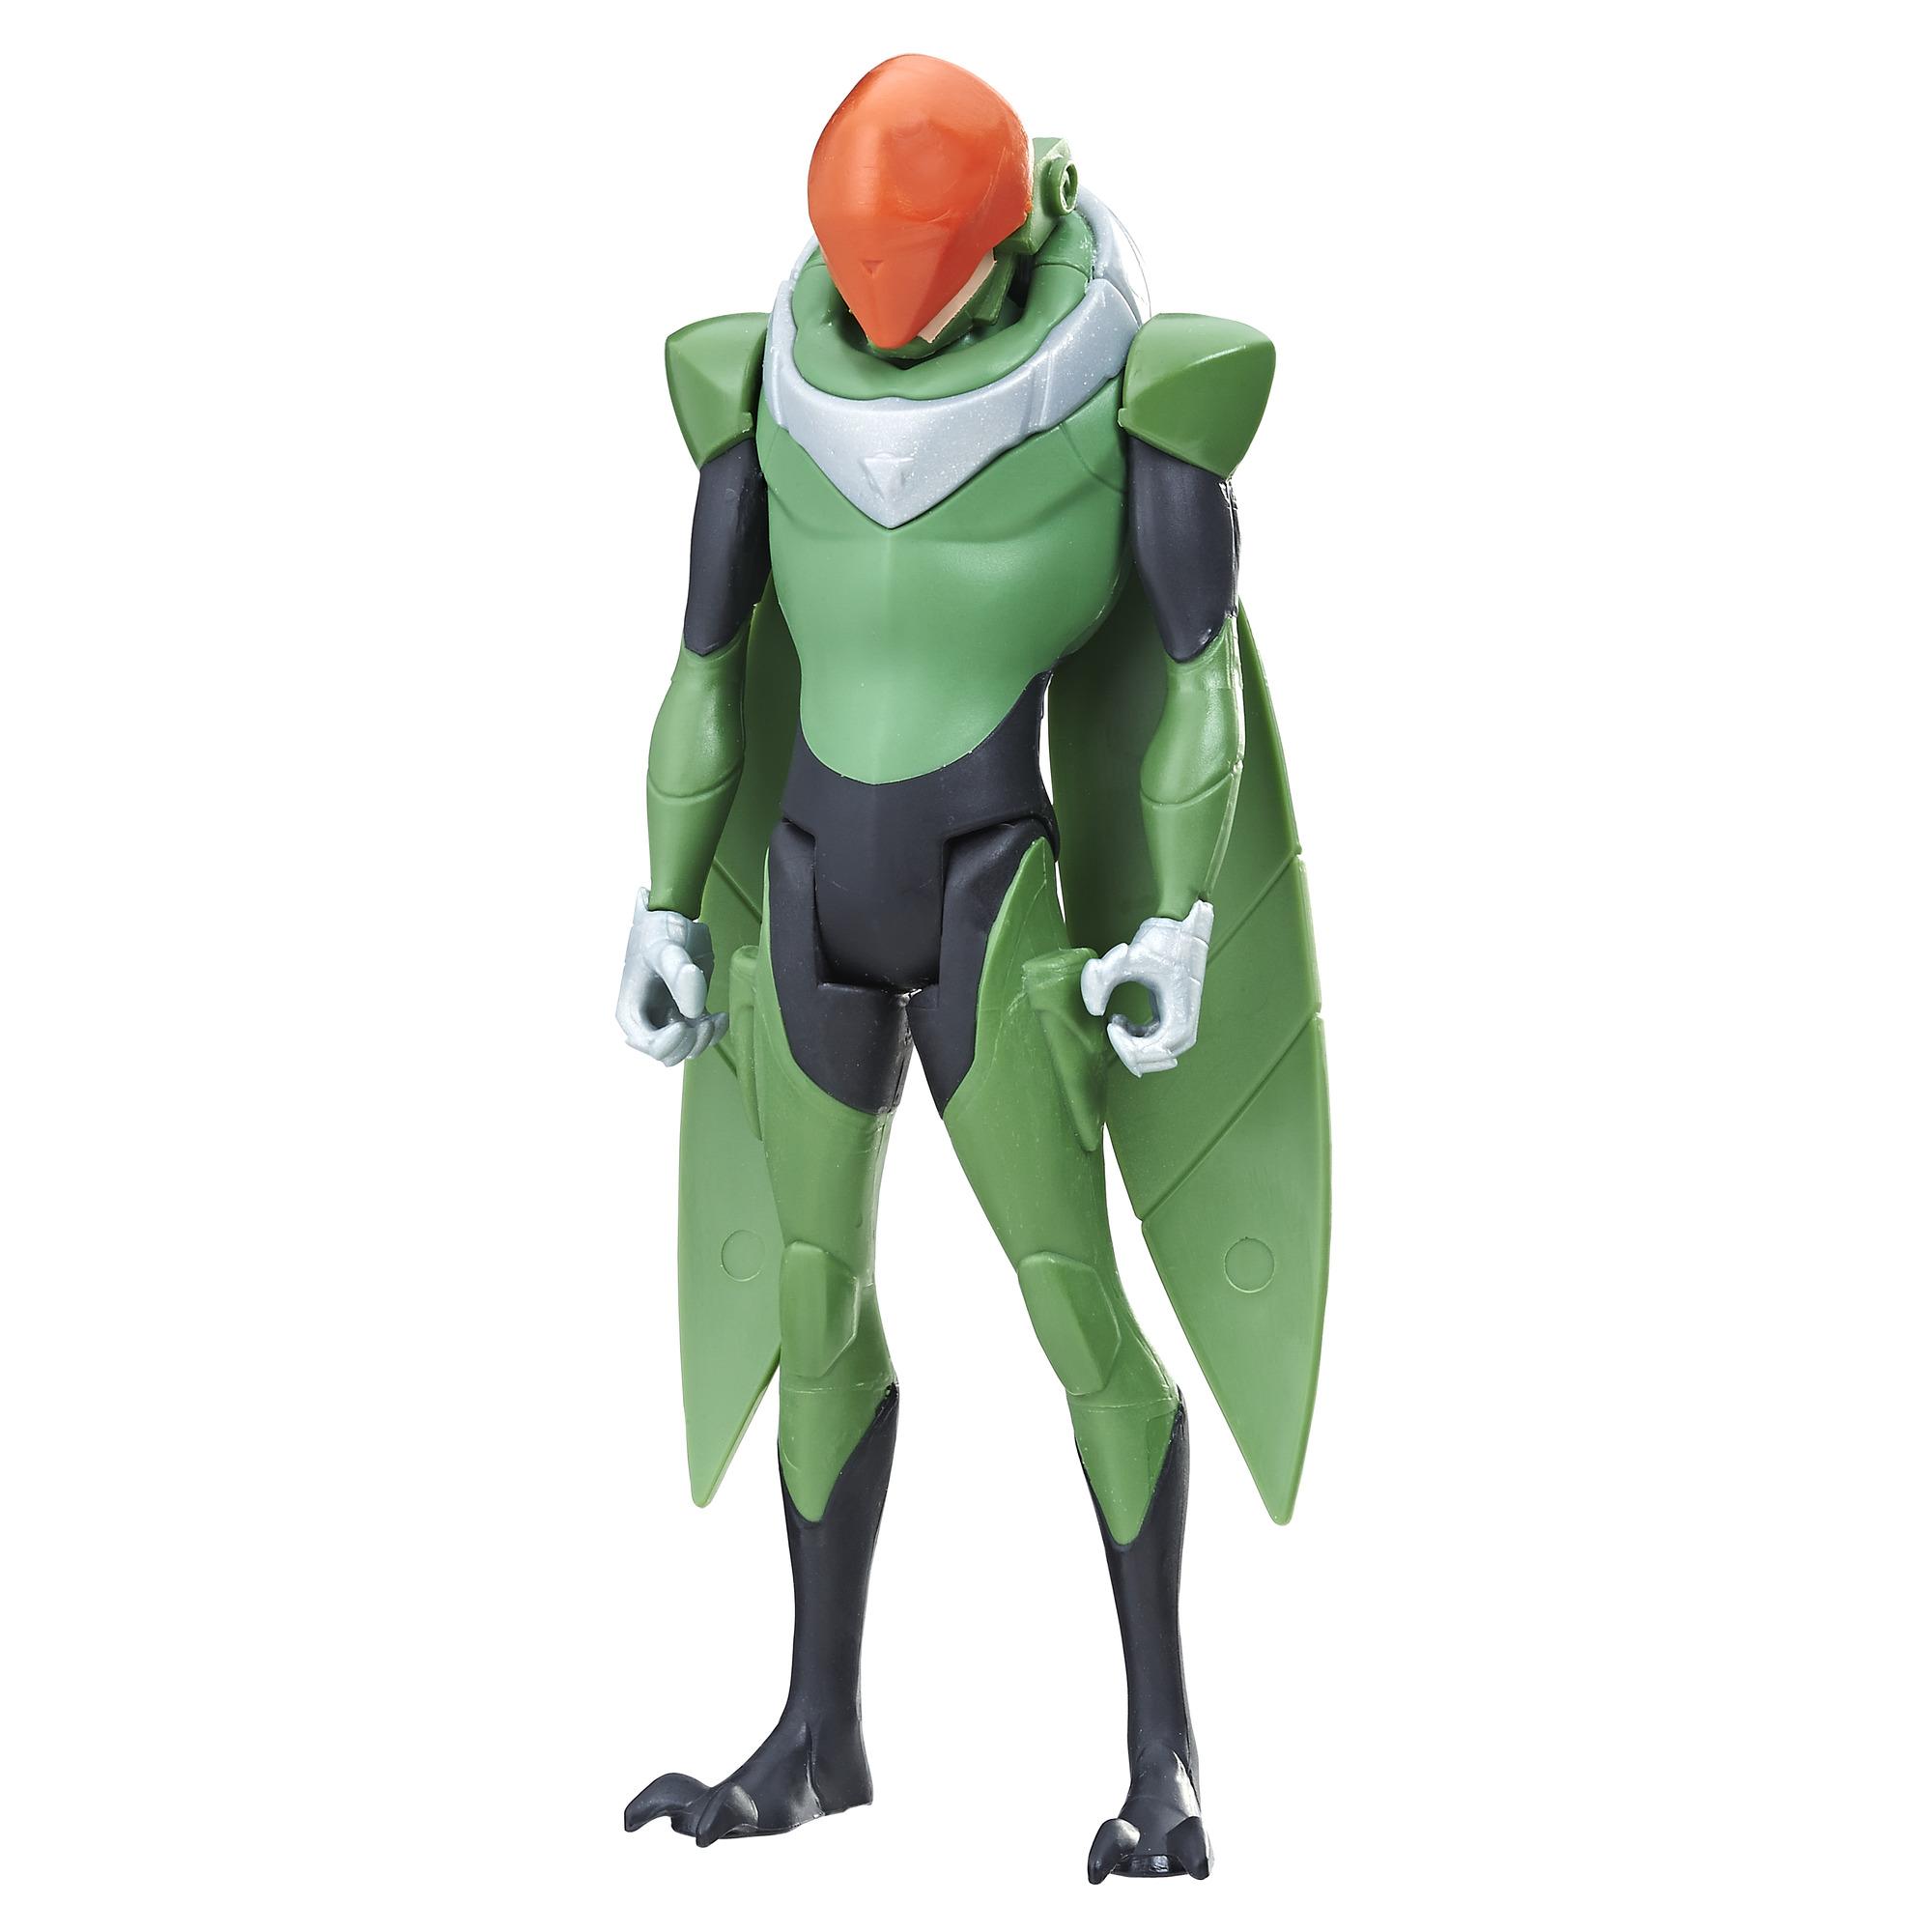 Spider-Man 6-inch Marvel's Vulture Figure